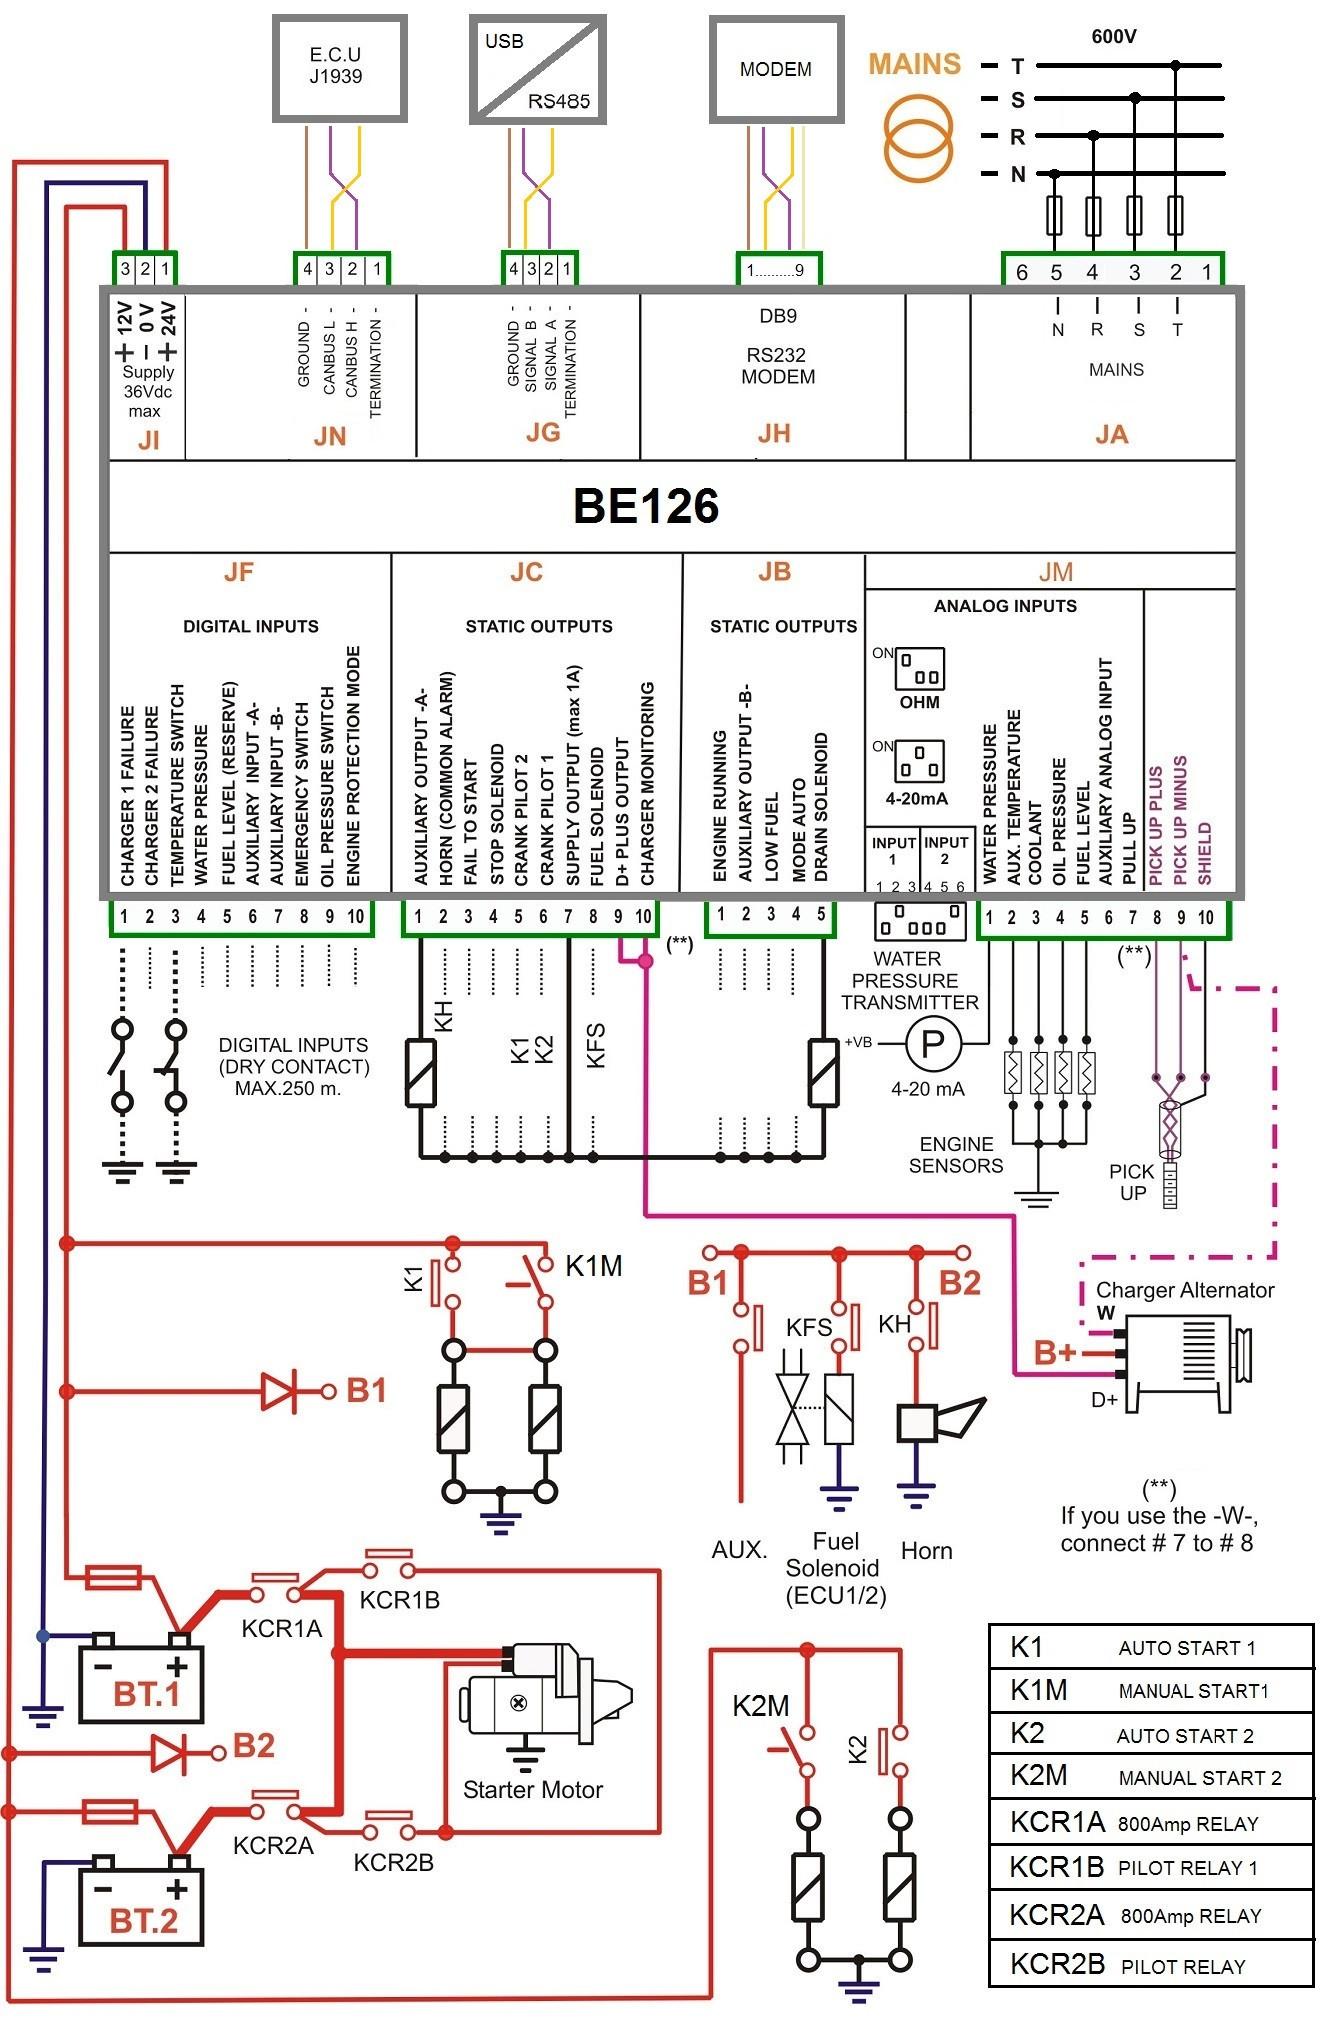 Fire Alarm Control Panel Wiring Diagram